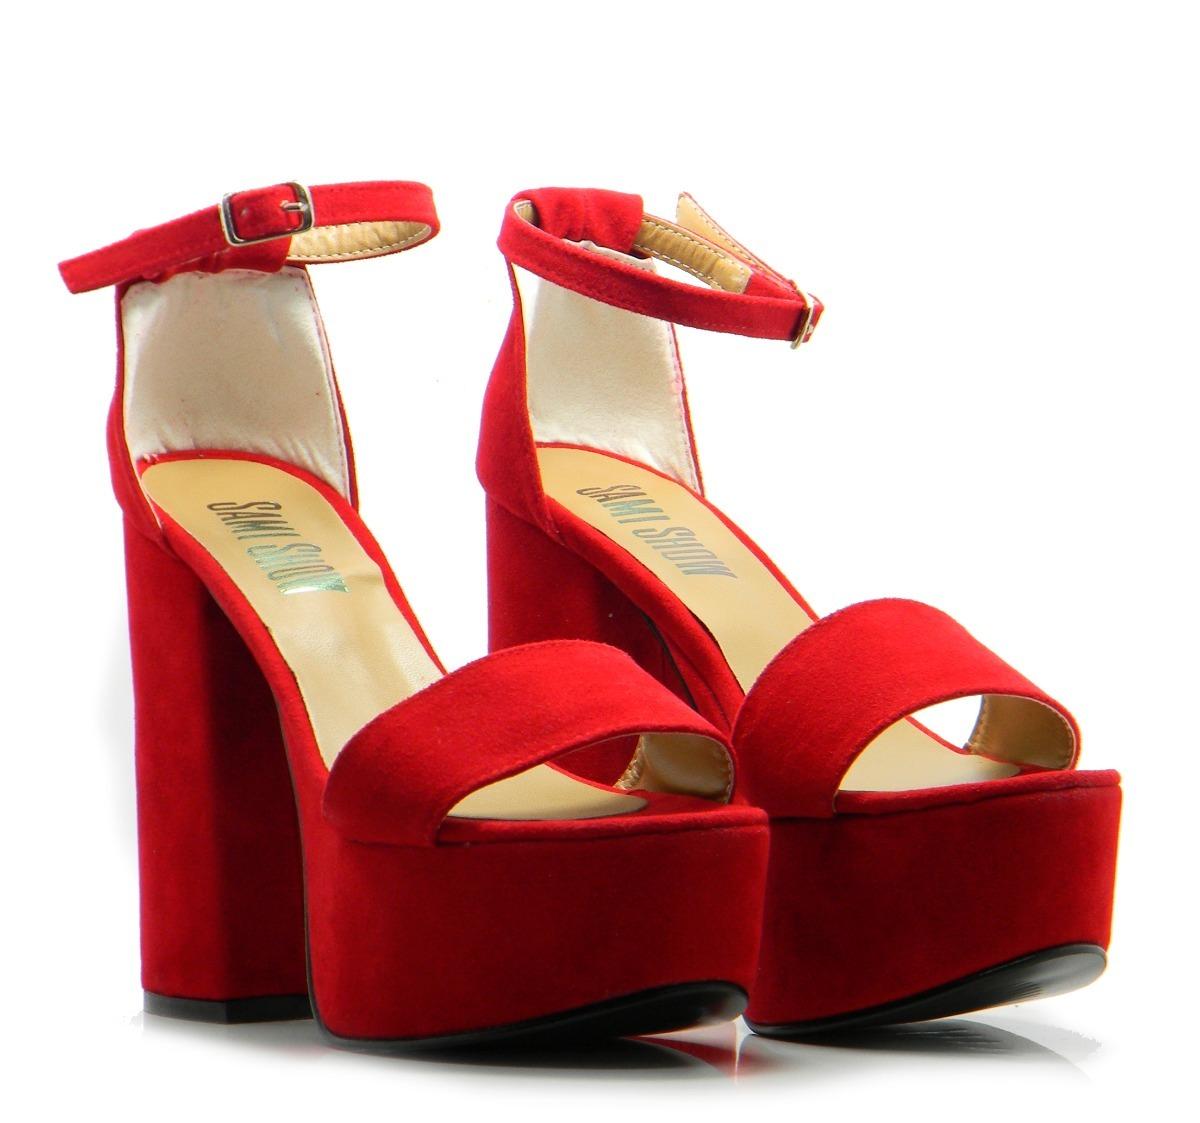 364b603c zapato rojo sandalia mujer verano plataforma roja taco nuevo. Cargando zoom.